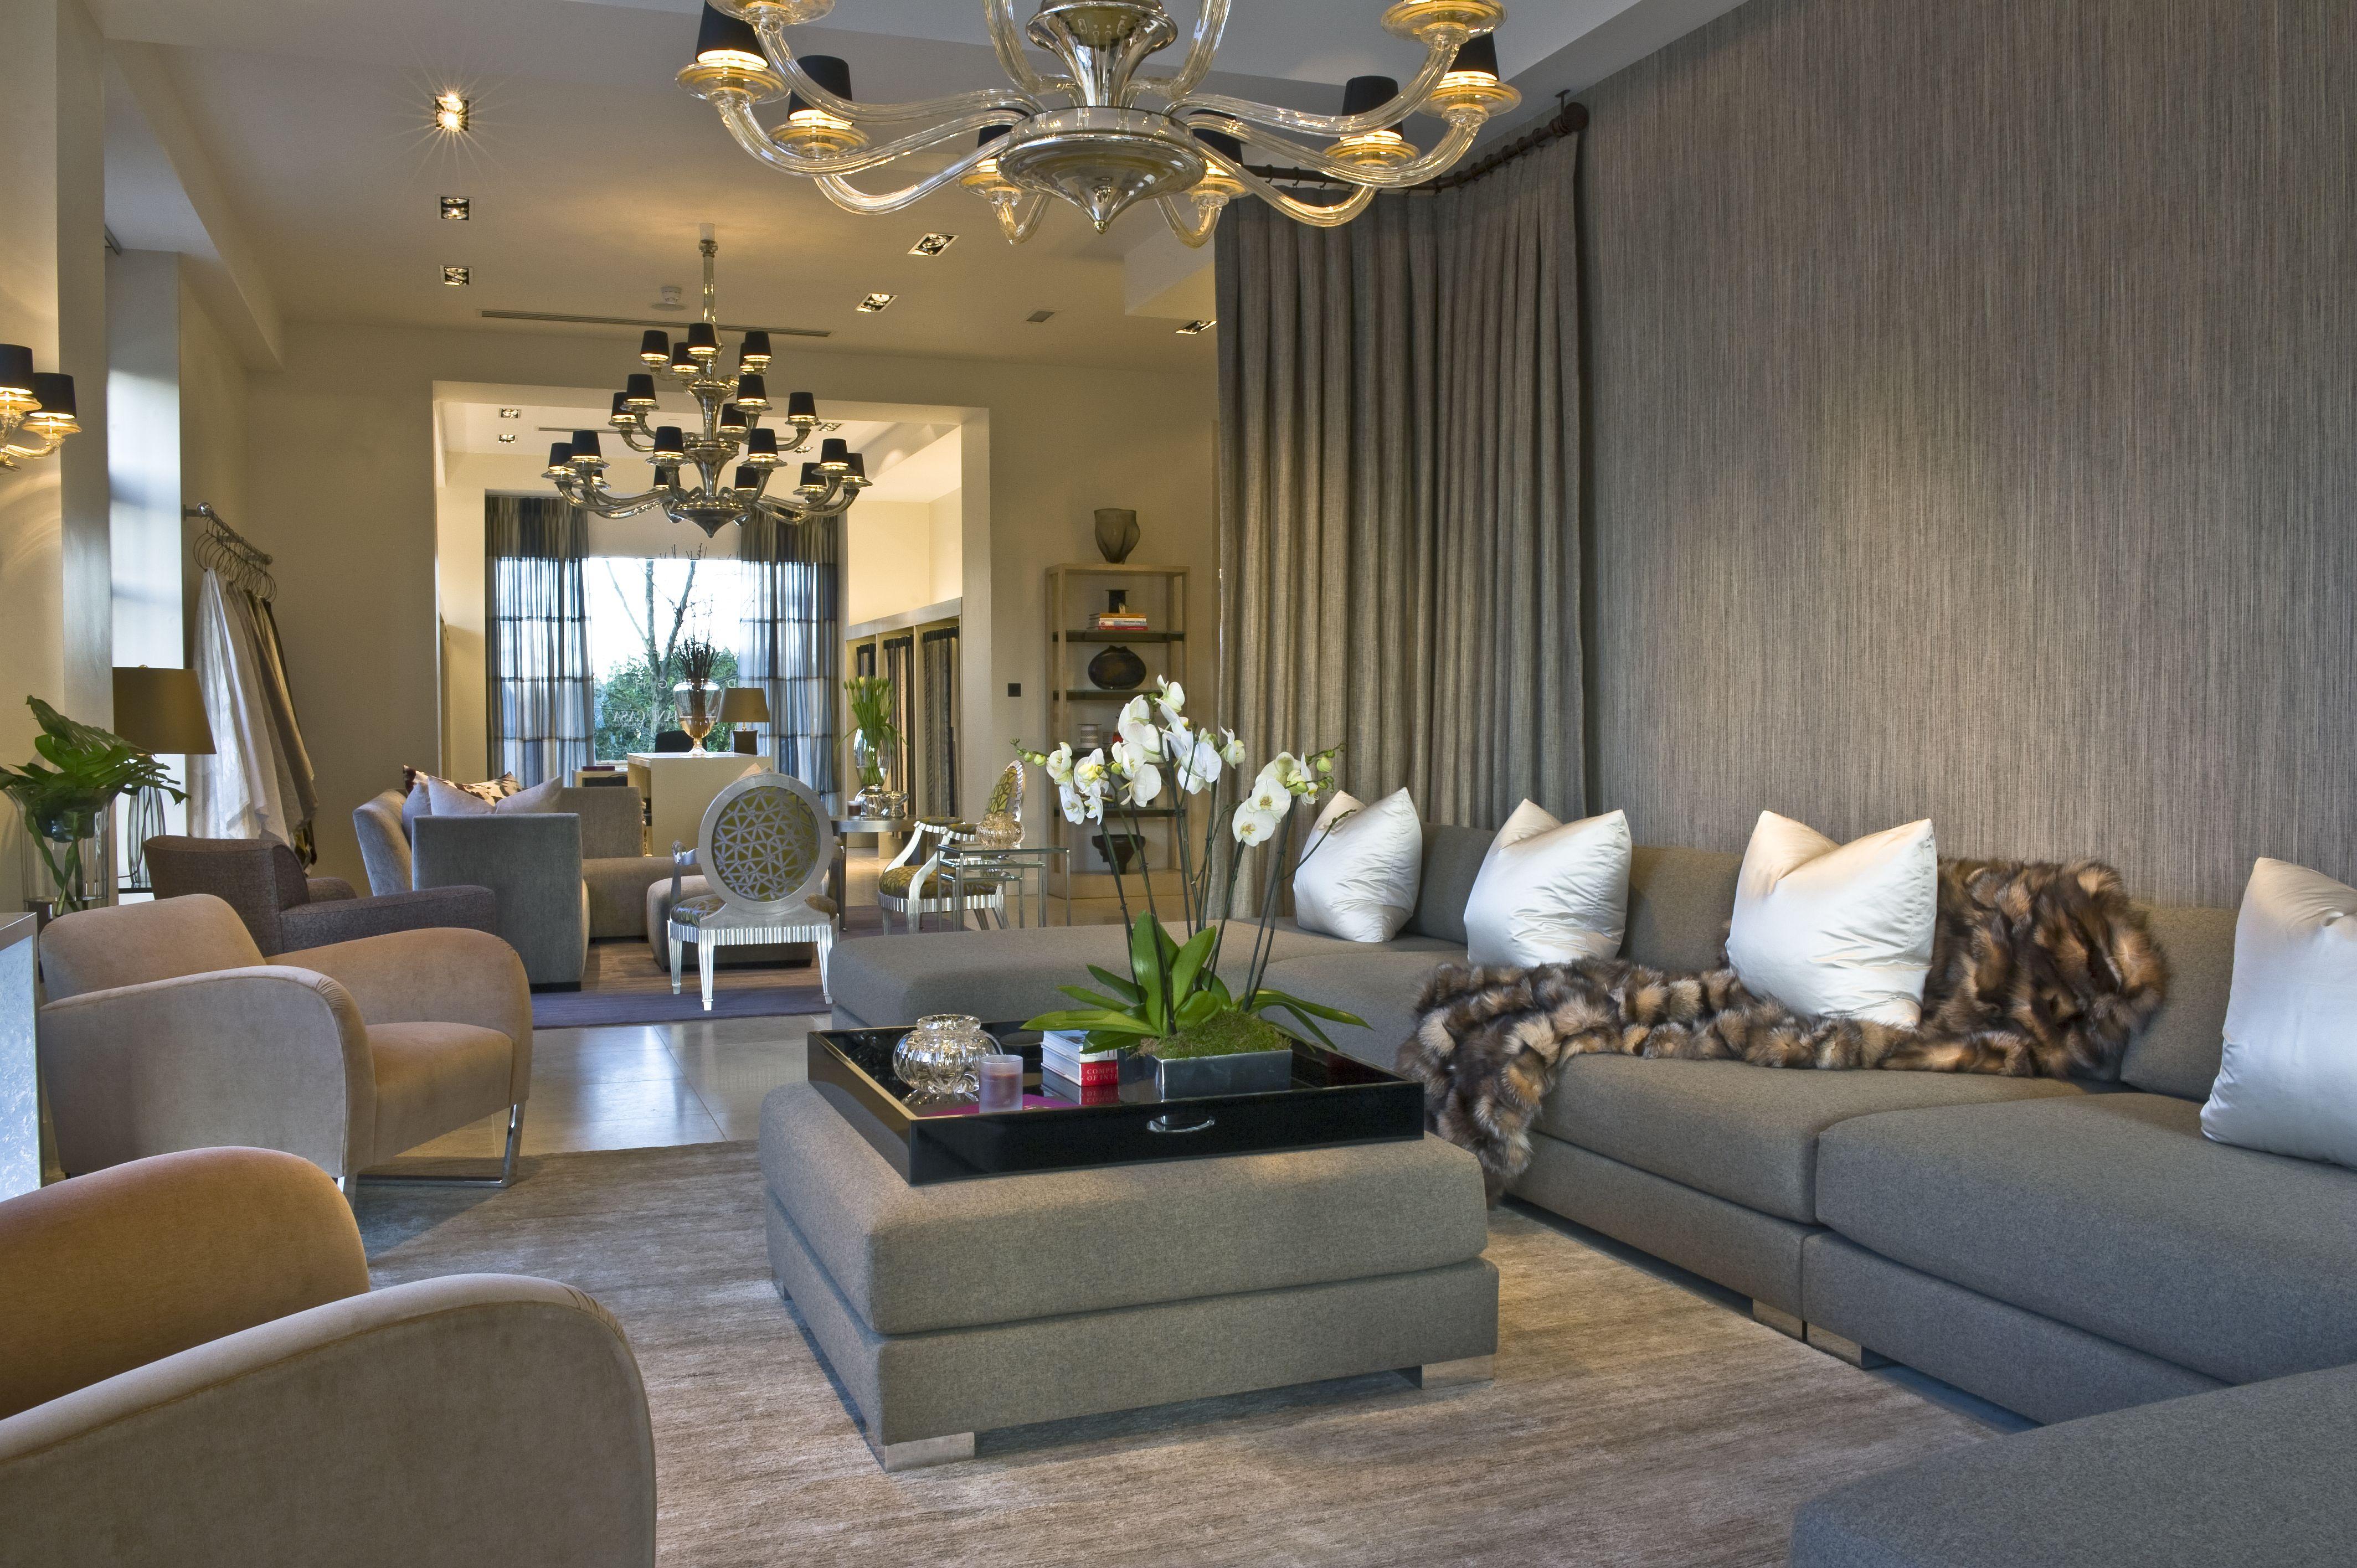 Donghia Mobili ~ Luxury furniture retail store interior design donghia showroom in